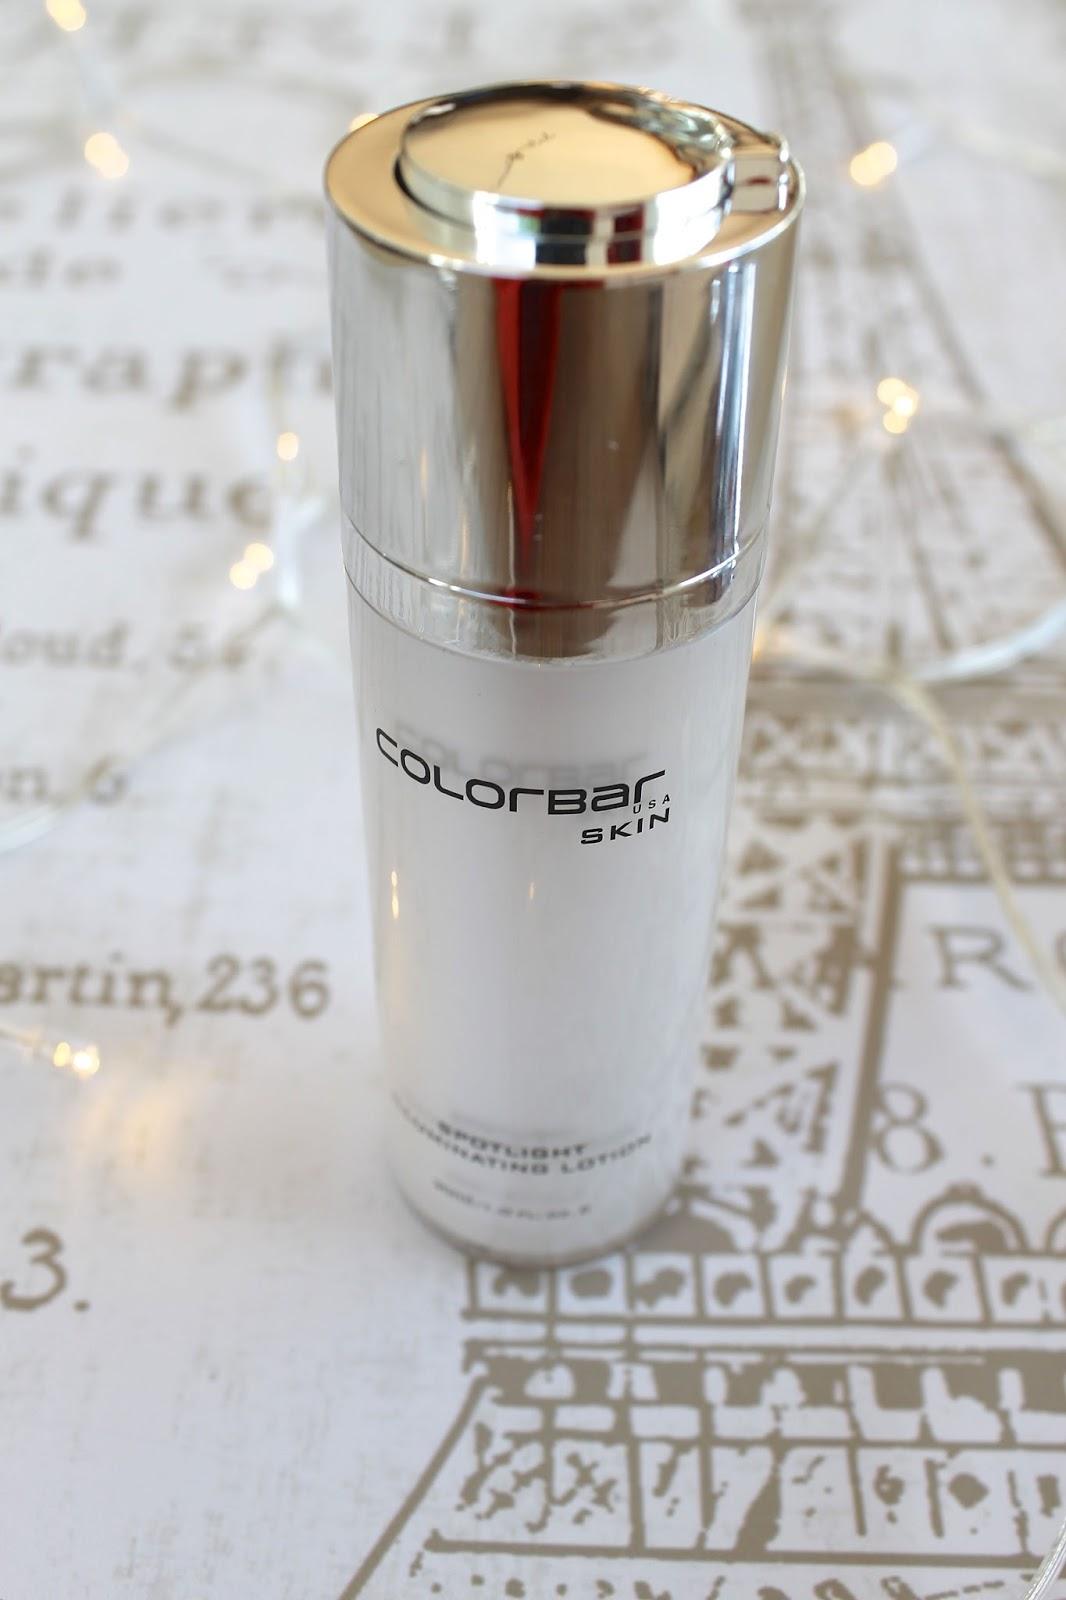 Colorbar cosmetics illuminating lotion